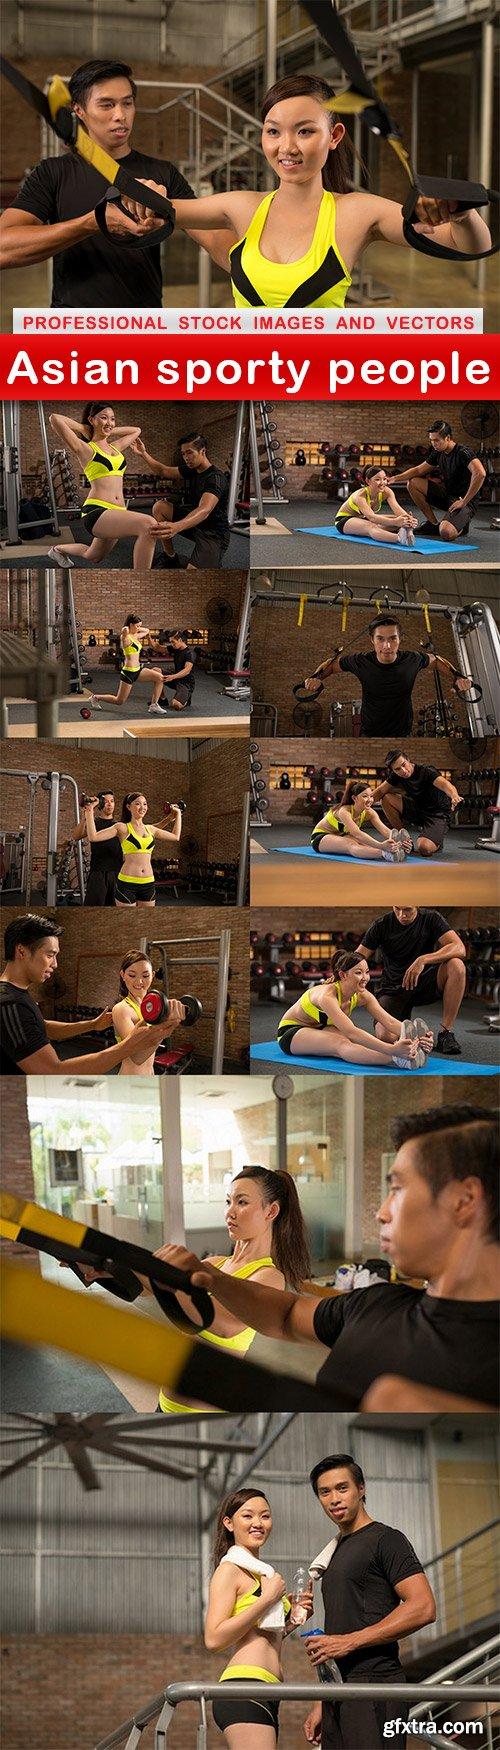 Asian sporty people - 11 UHQ JPEG